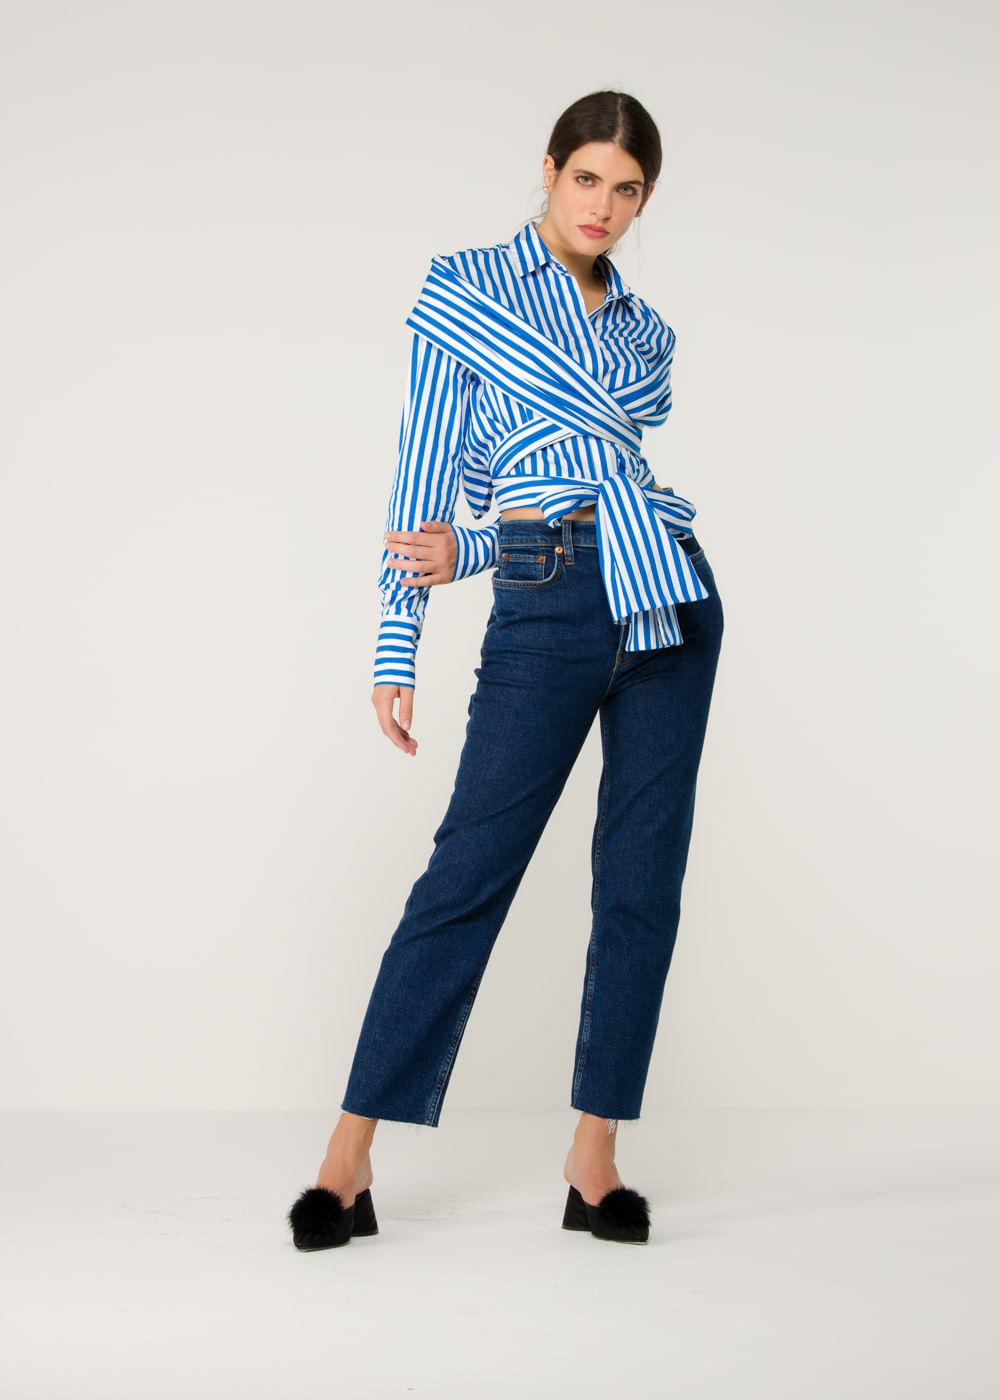 Calça Jeans High Rise Stovepipe Dark Jeans 29 Us